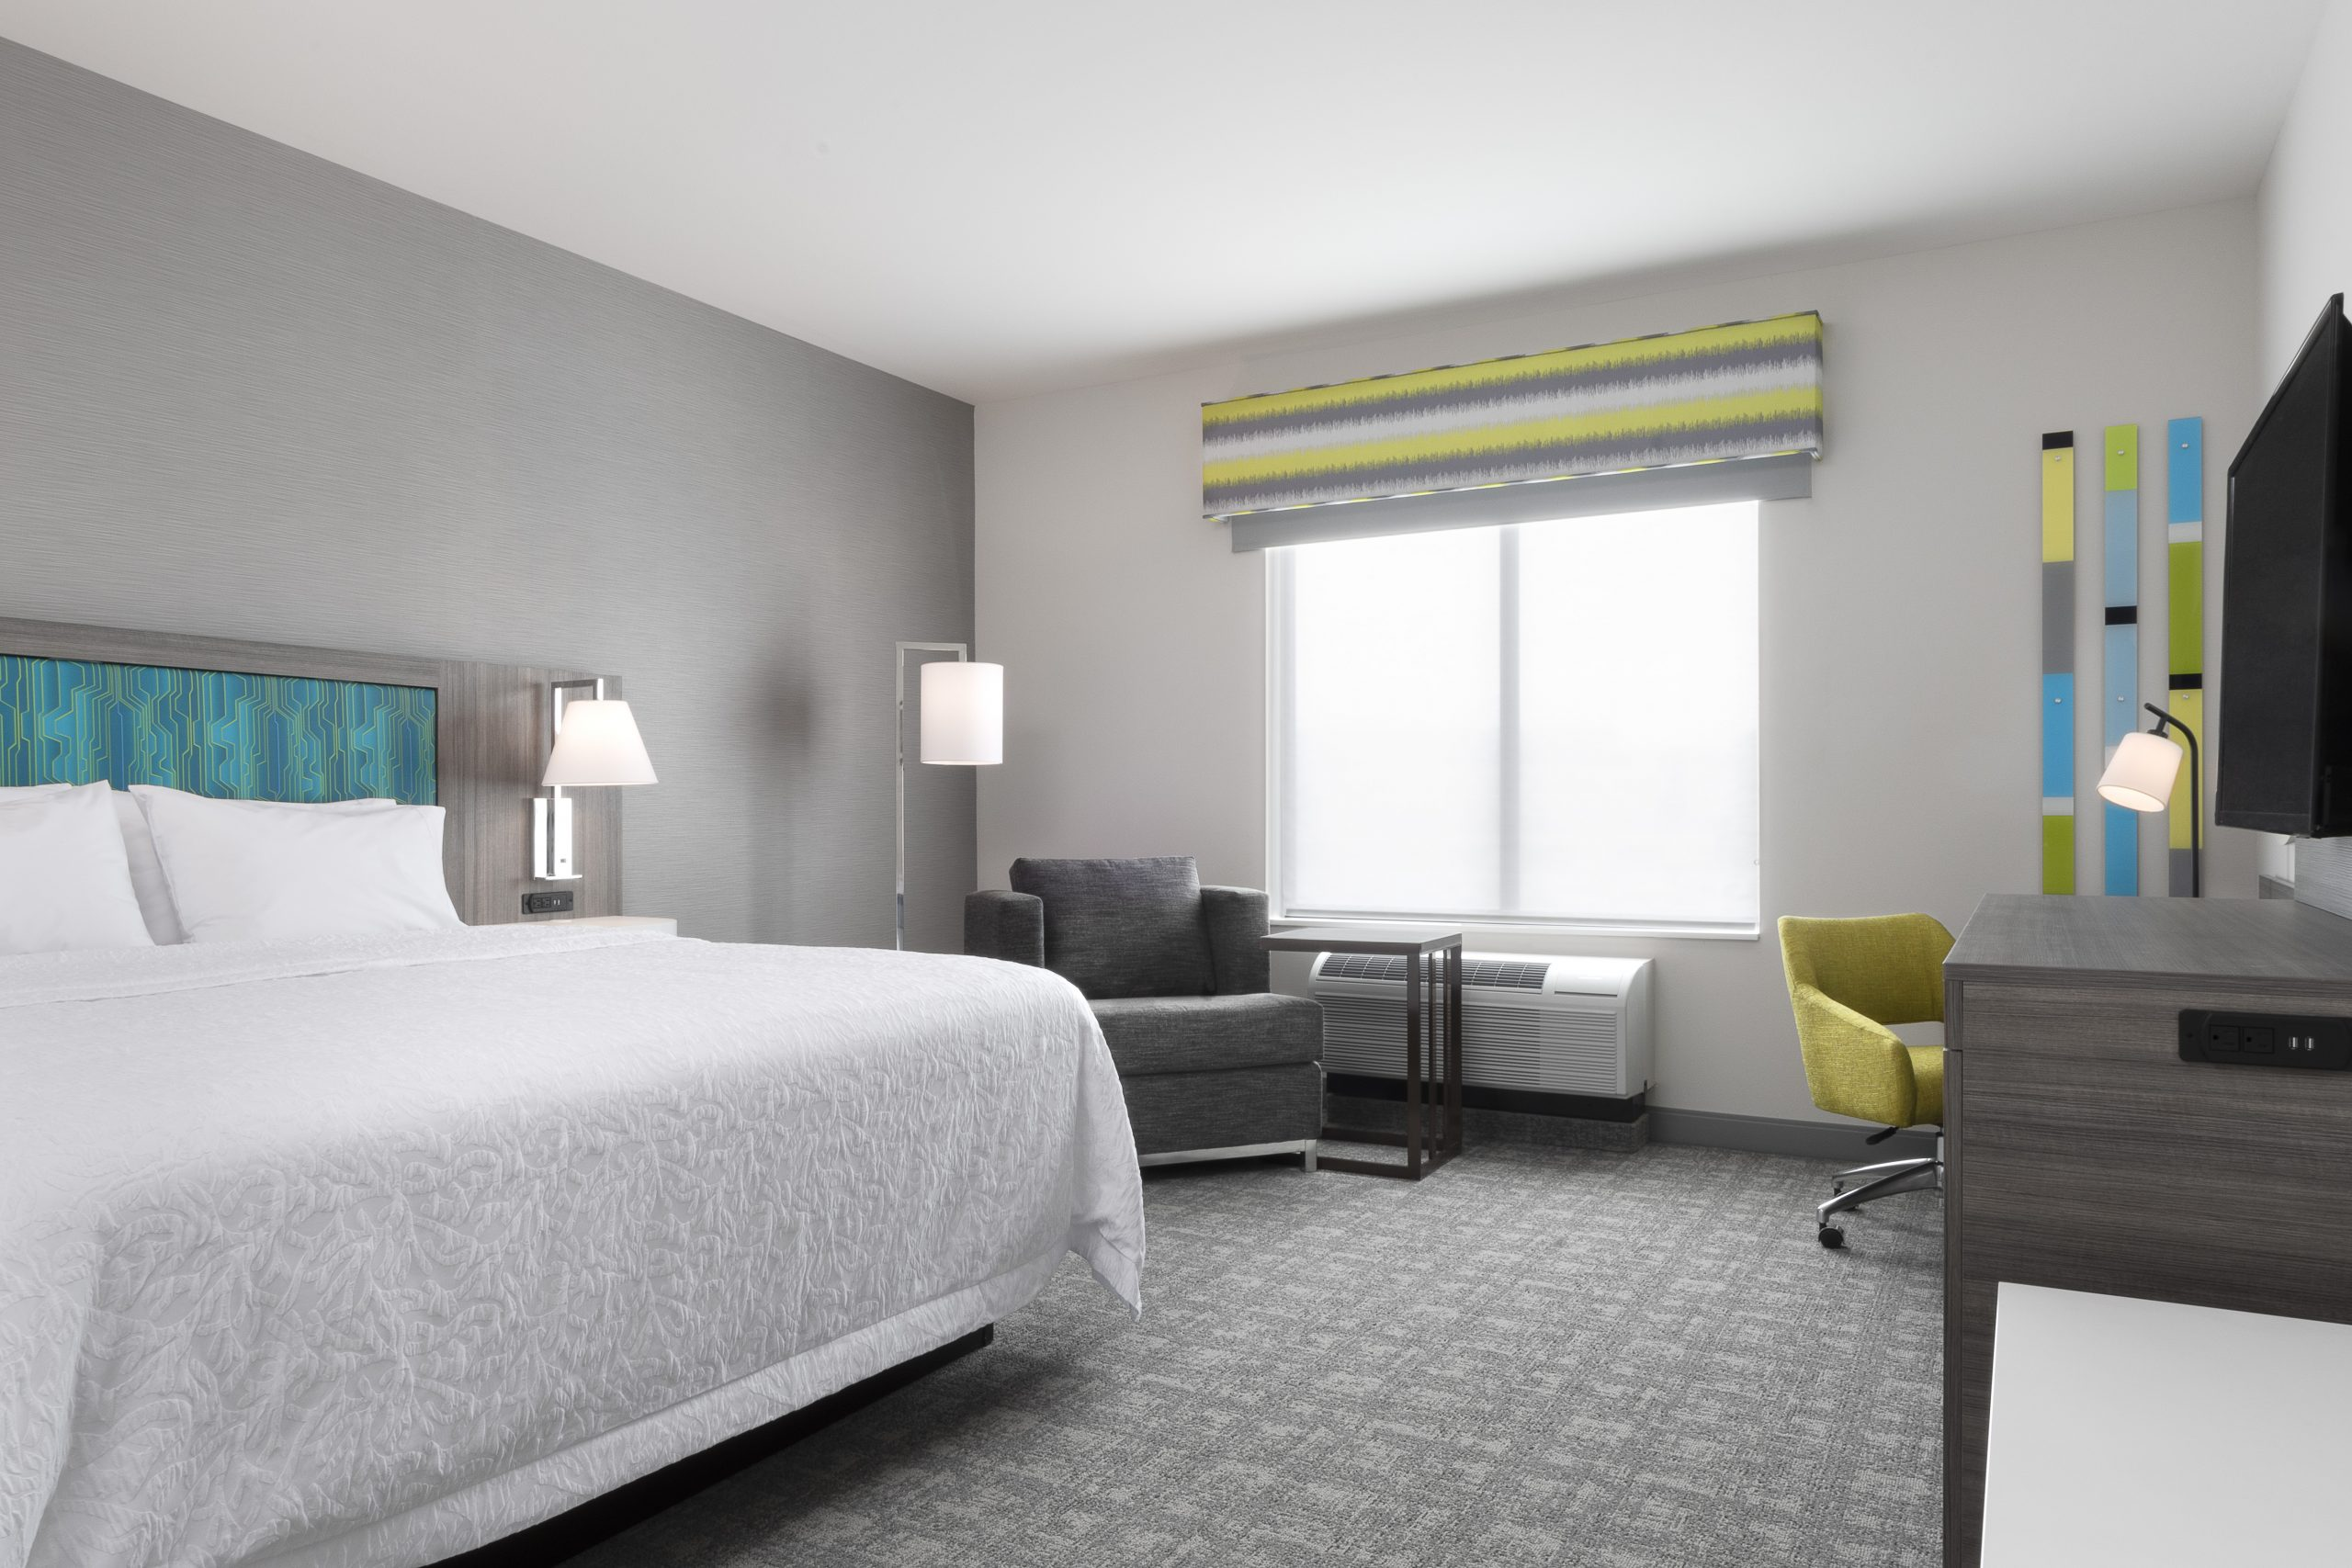 Hampton Inn OFallon IL, Guest Room 3